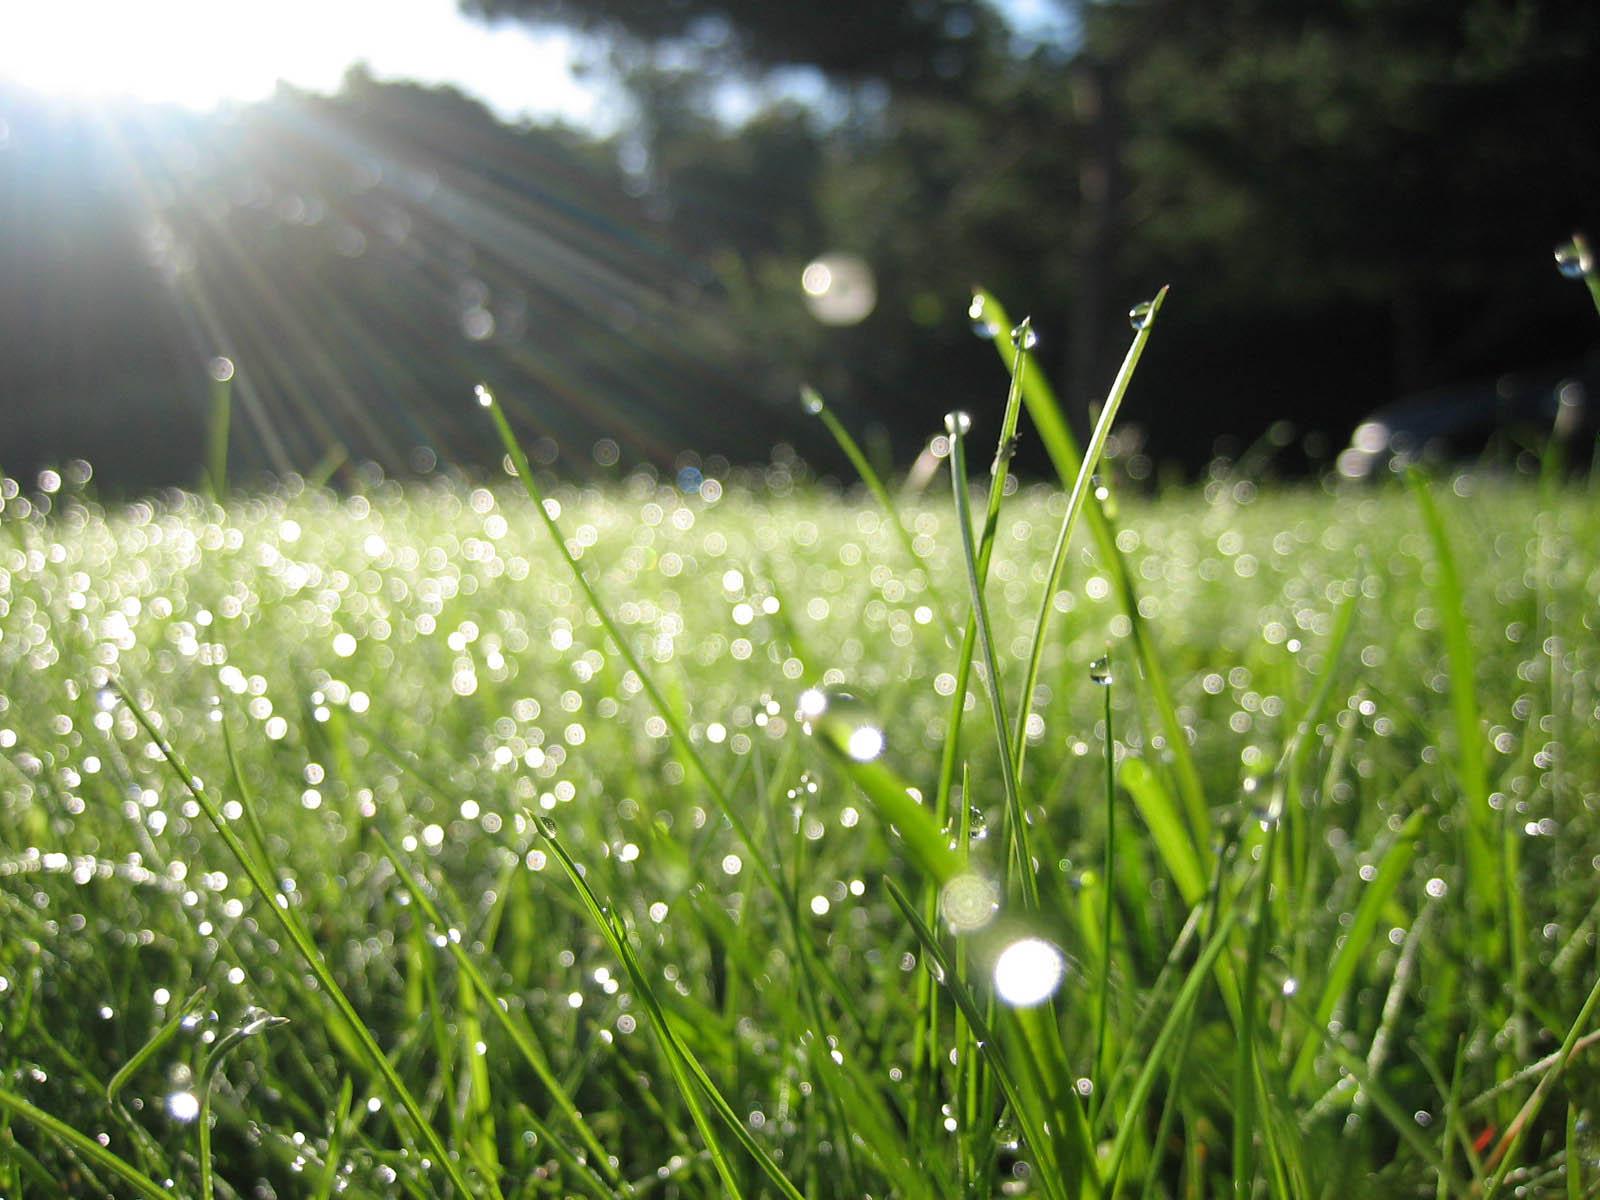 In secercah cahaya untuk embun di pagi hari : mari kita berdakwah